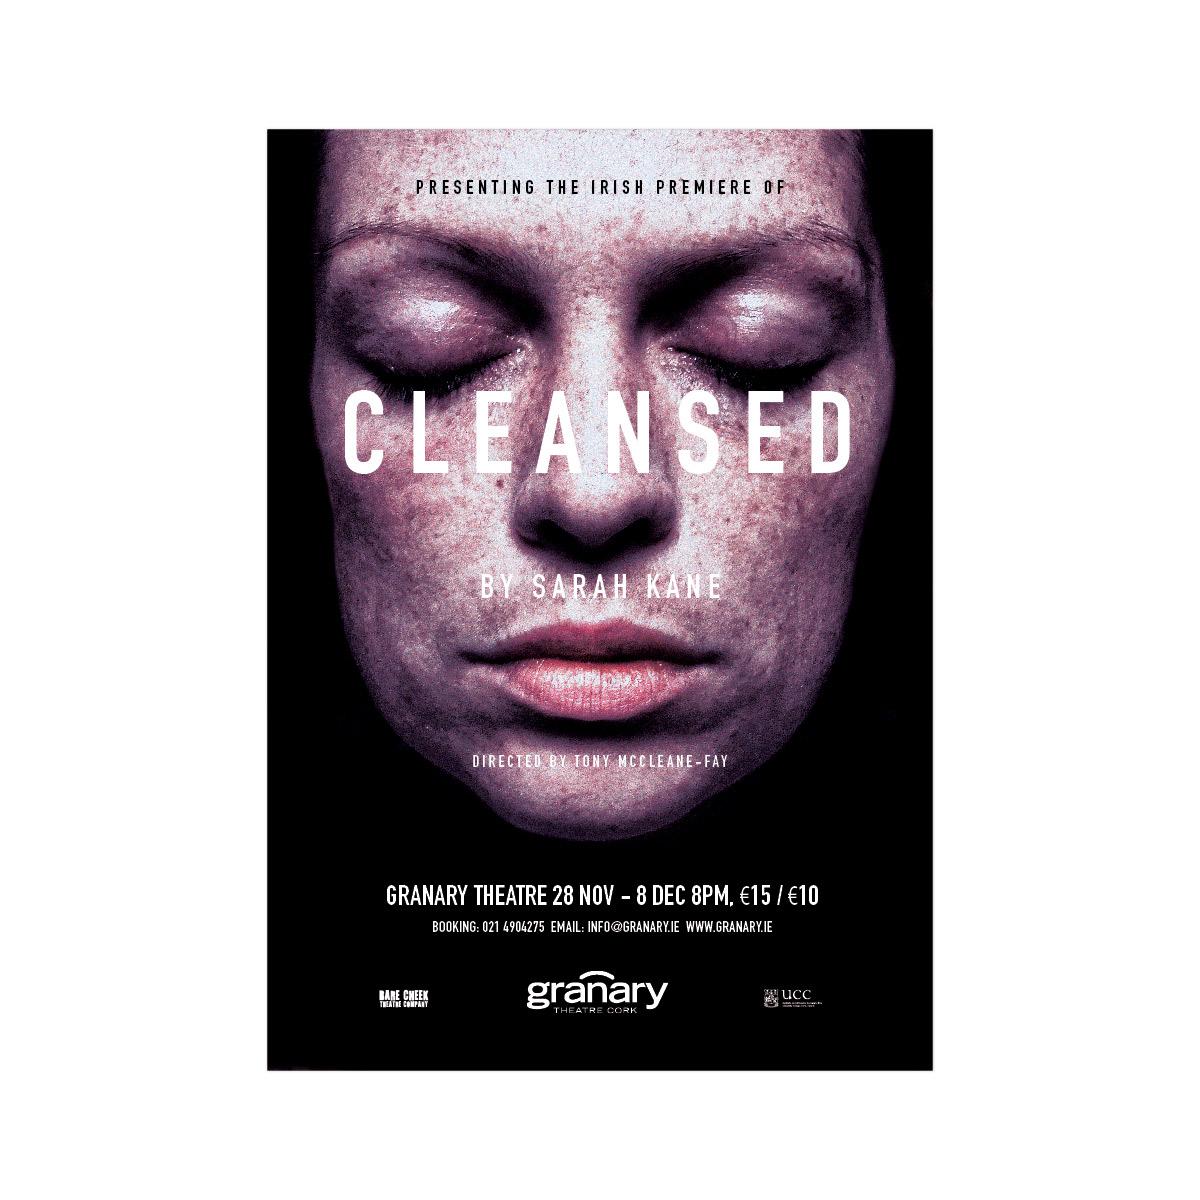 TheGranary_Cleansed.jpg